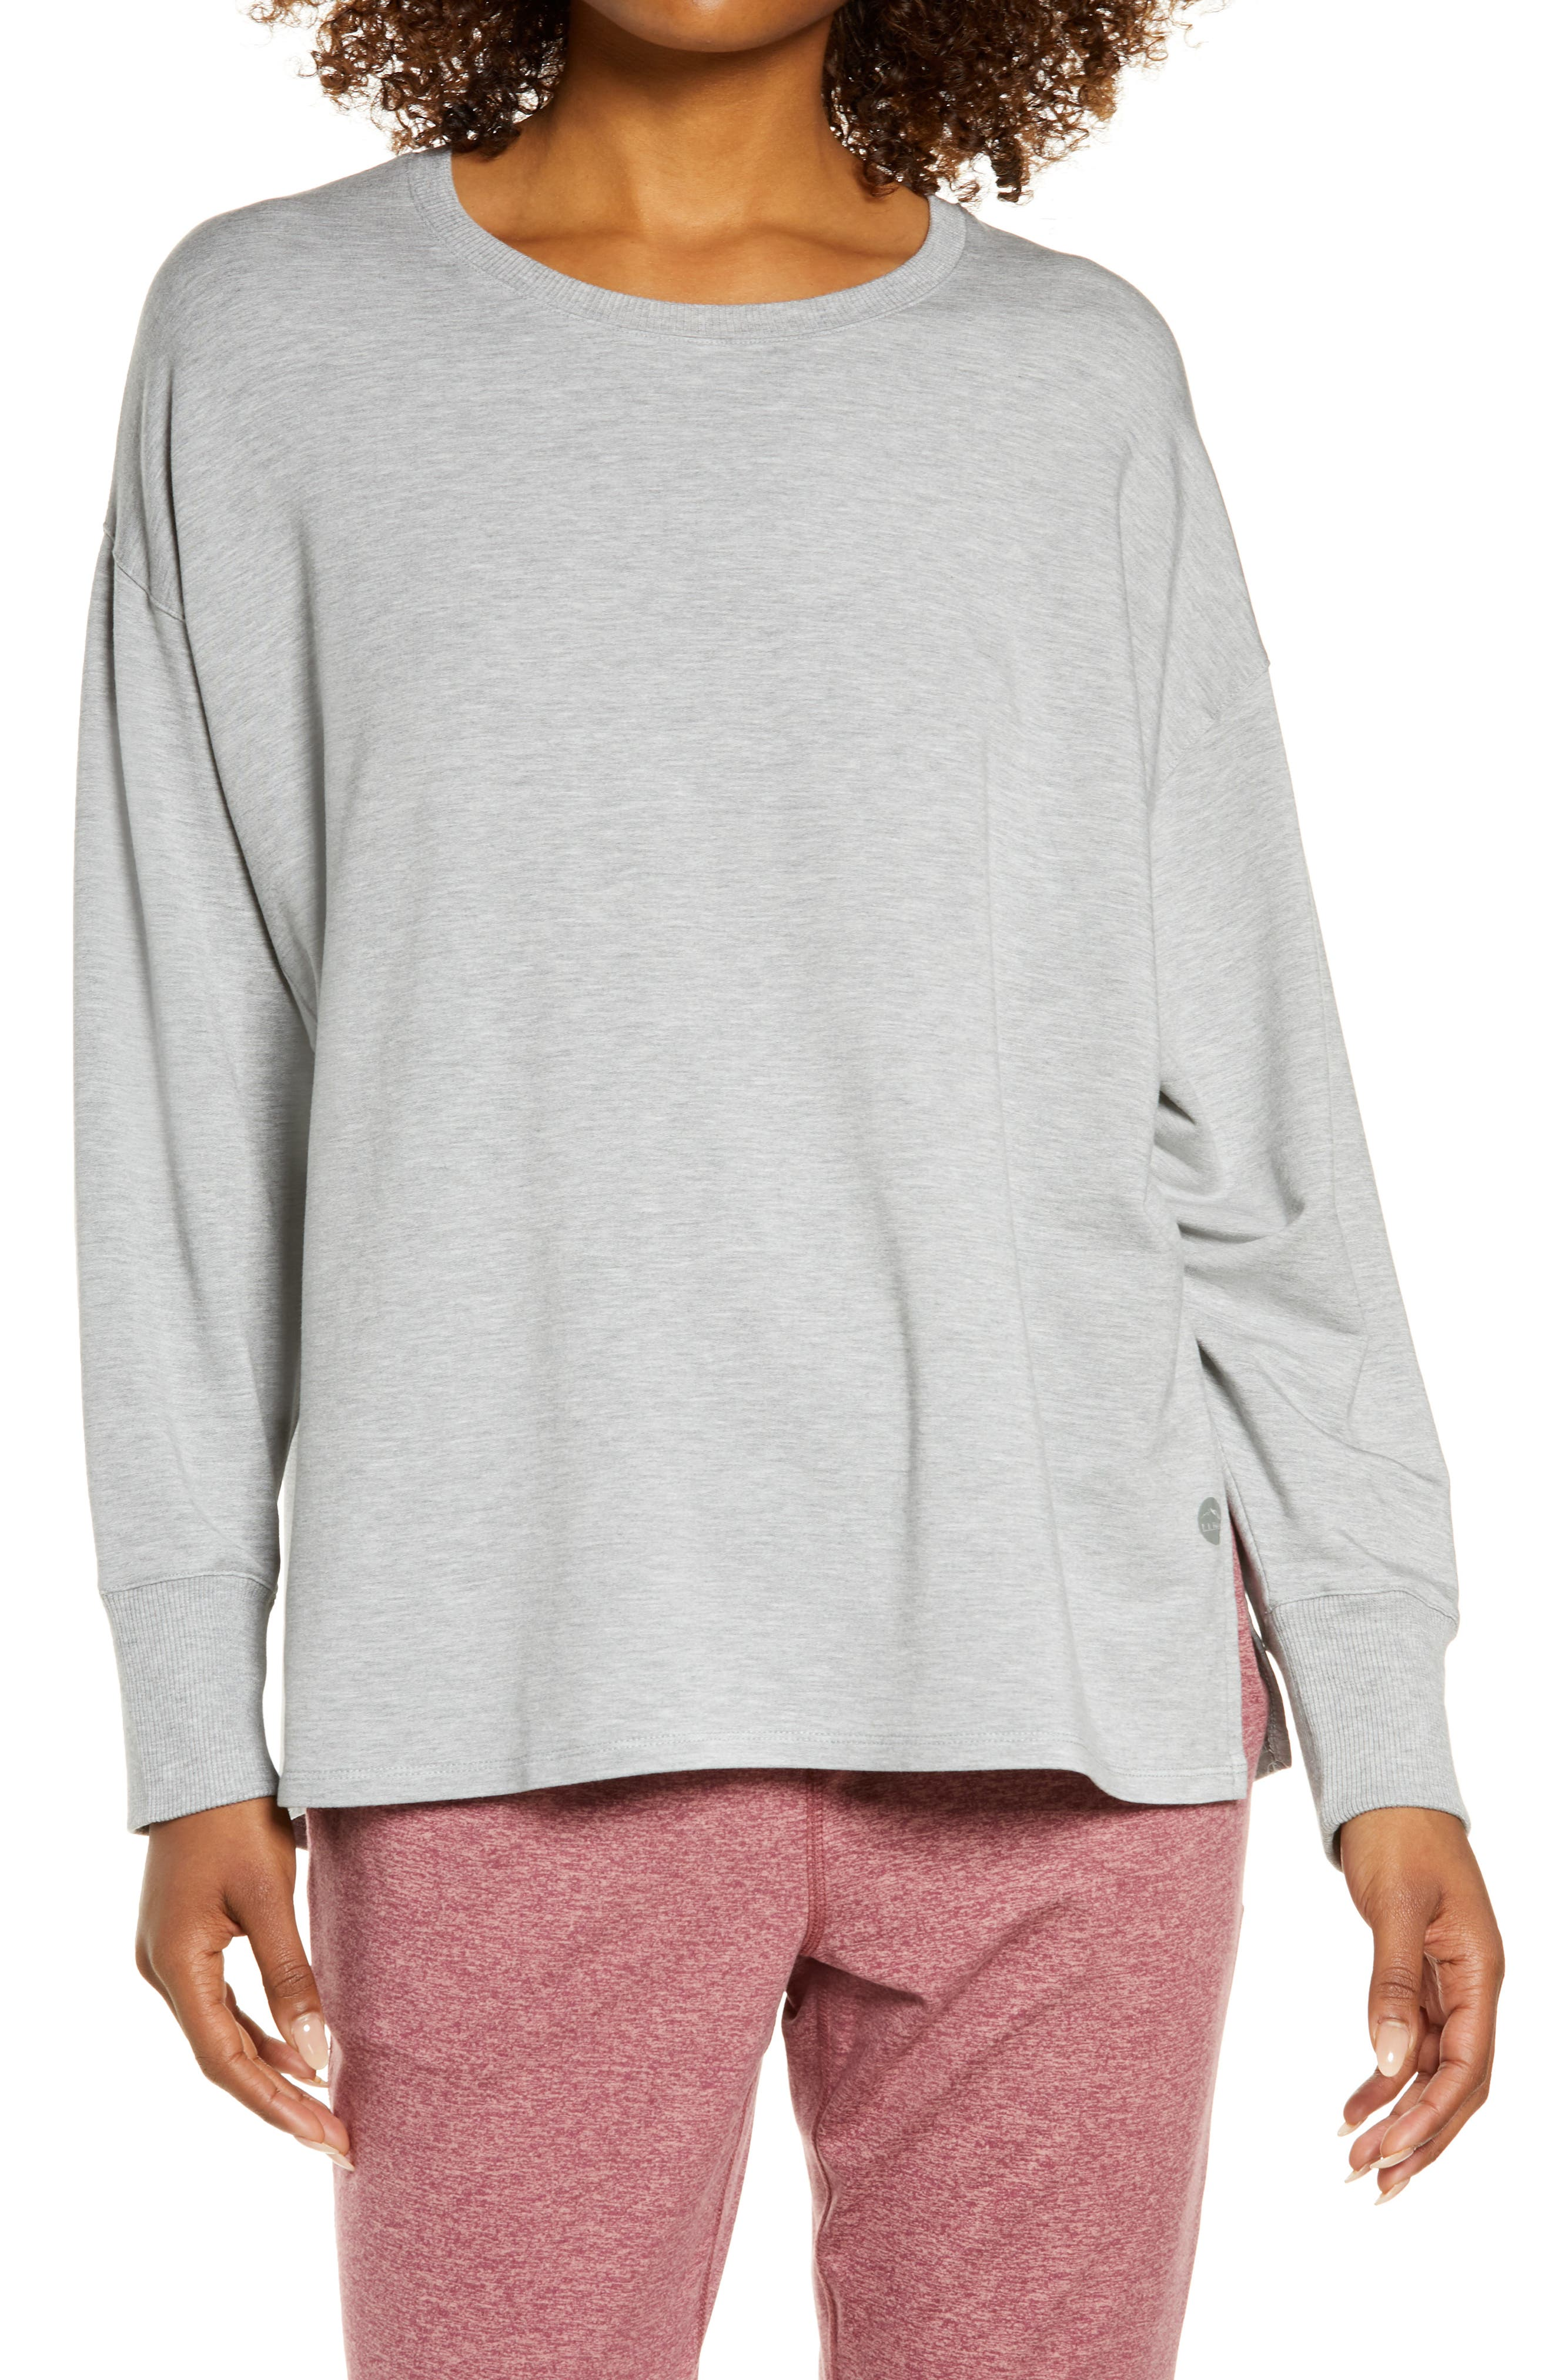 Softflex Sweatshirt